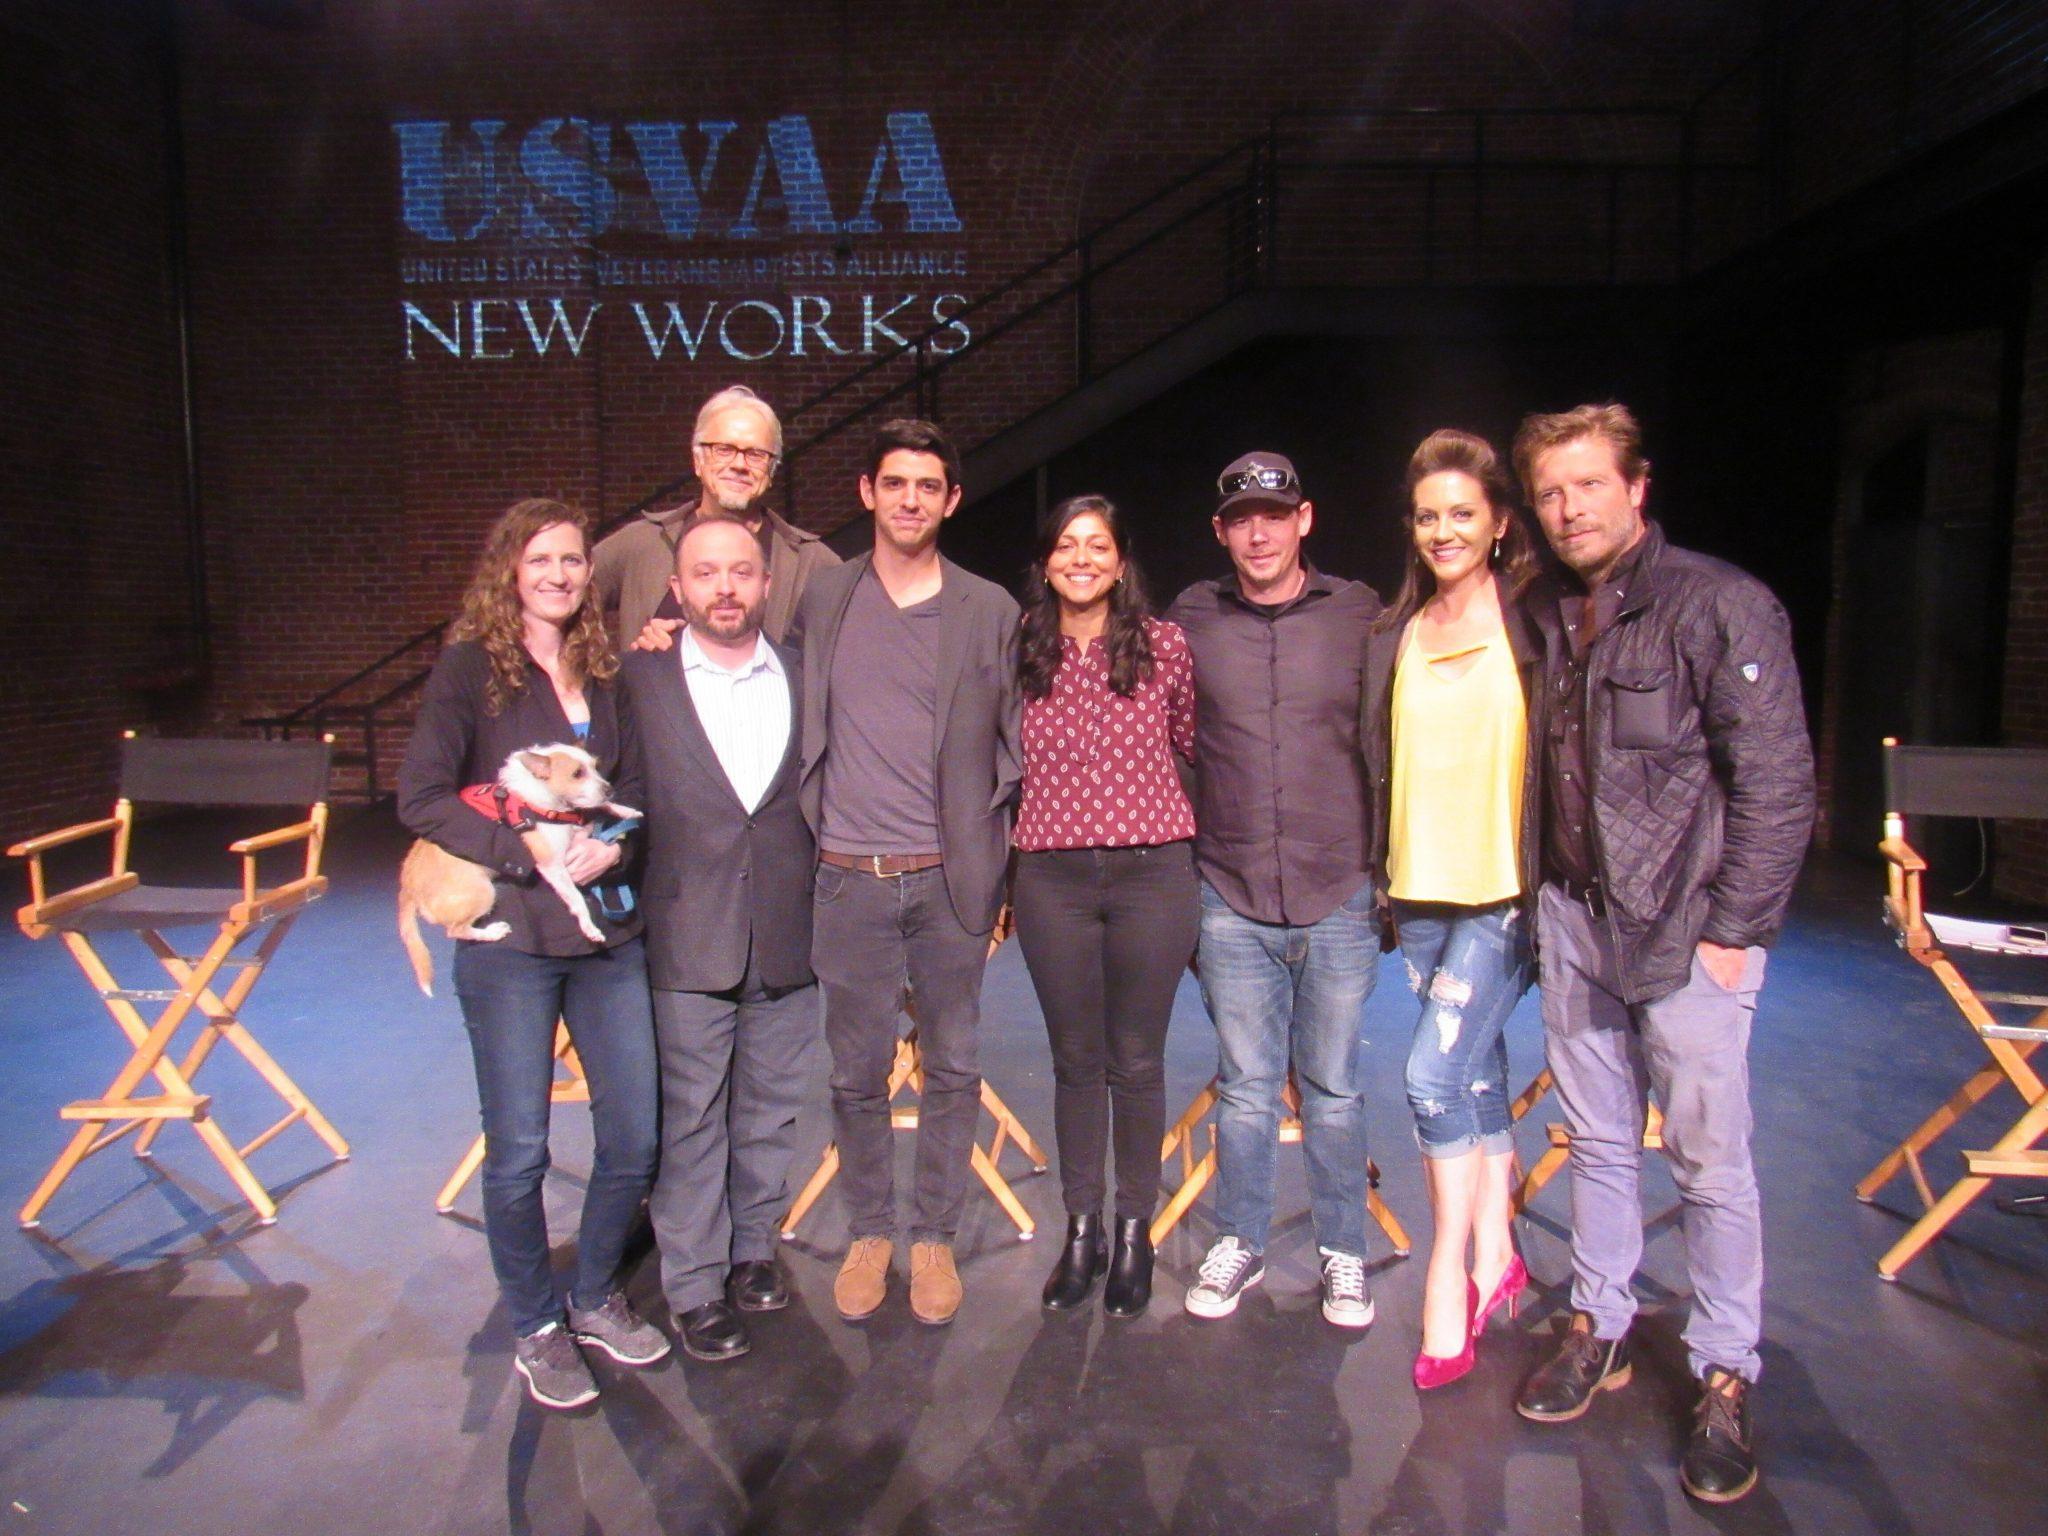 USVAA New Works 2018 with Katie Robinson, Kadyn Michaels, Tim Robbins, Izzy Izagui, Sati Kaur, Rick McGovern, Melissa Ritz and Christopher Sweeney